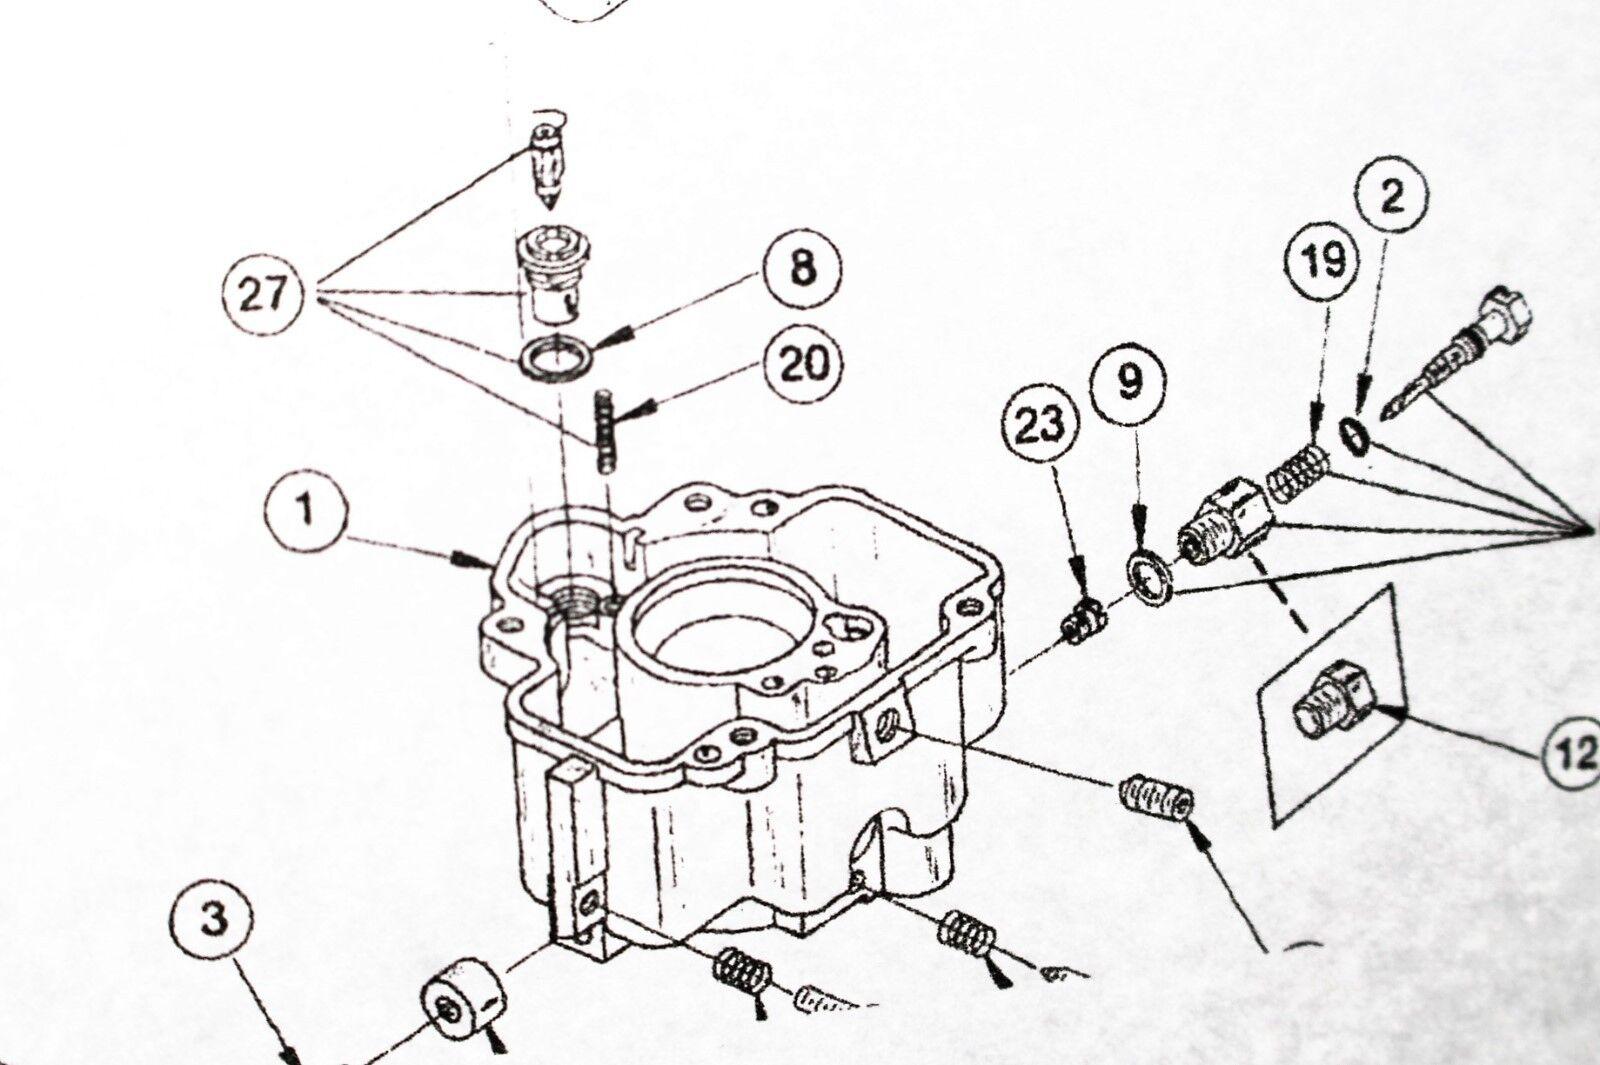 Carburetor Kit & Diagram LUA7 fits Onan 146-0230D 6.5 NH 4.0 BFA 5.0 on kawasaki klx 140l, kawasaki fs730v, kawasaki teryx 750 4x4, kawasaki klx 110l, kawasaki z1000 abs, kawasaki fd750d, kawasaki fh680v, kawasaki fuel pump, kawasaki fc290v, kawasaki fh601v, kawasaki fb460v, kawasaki mule 610 xc, kawasaki fs481v, kawasaki fj180v,